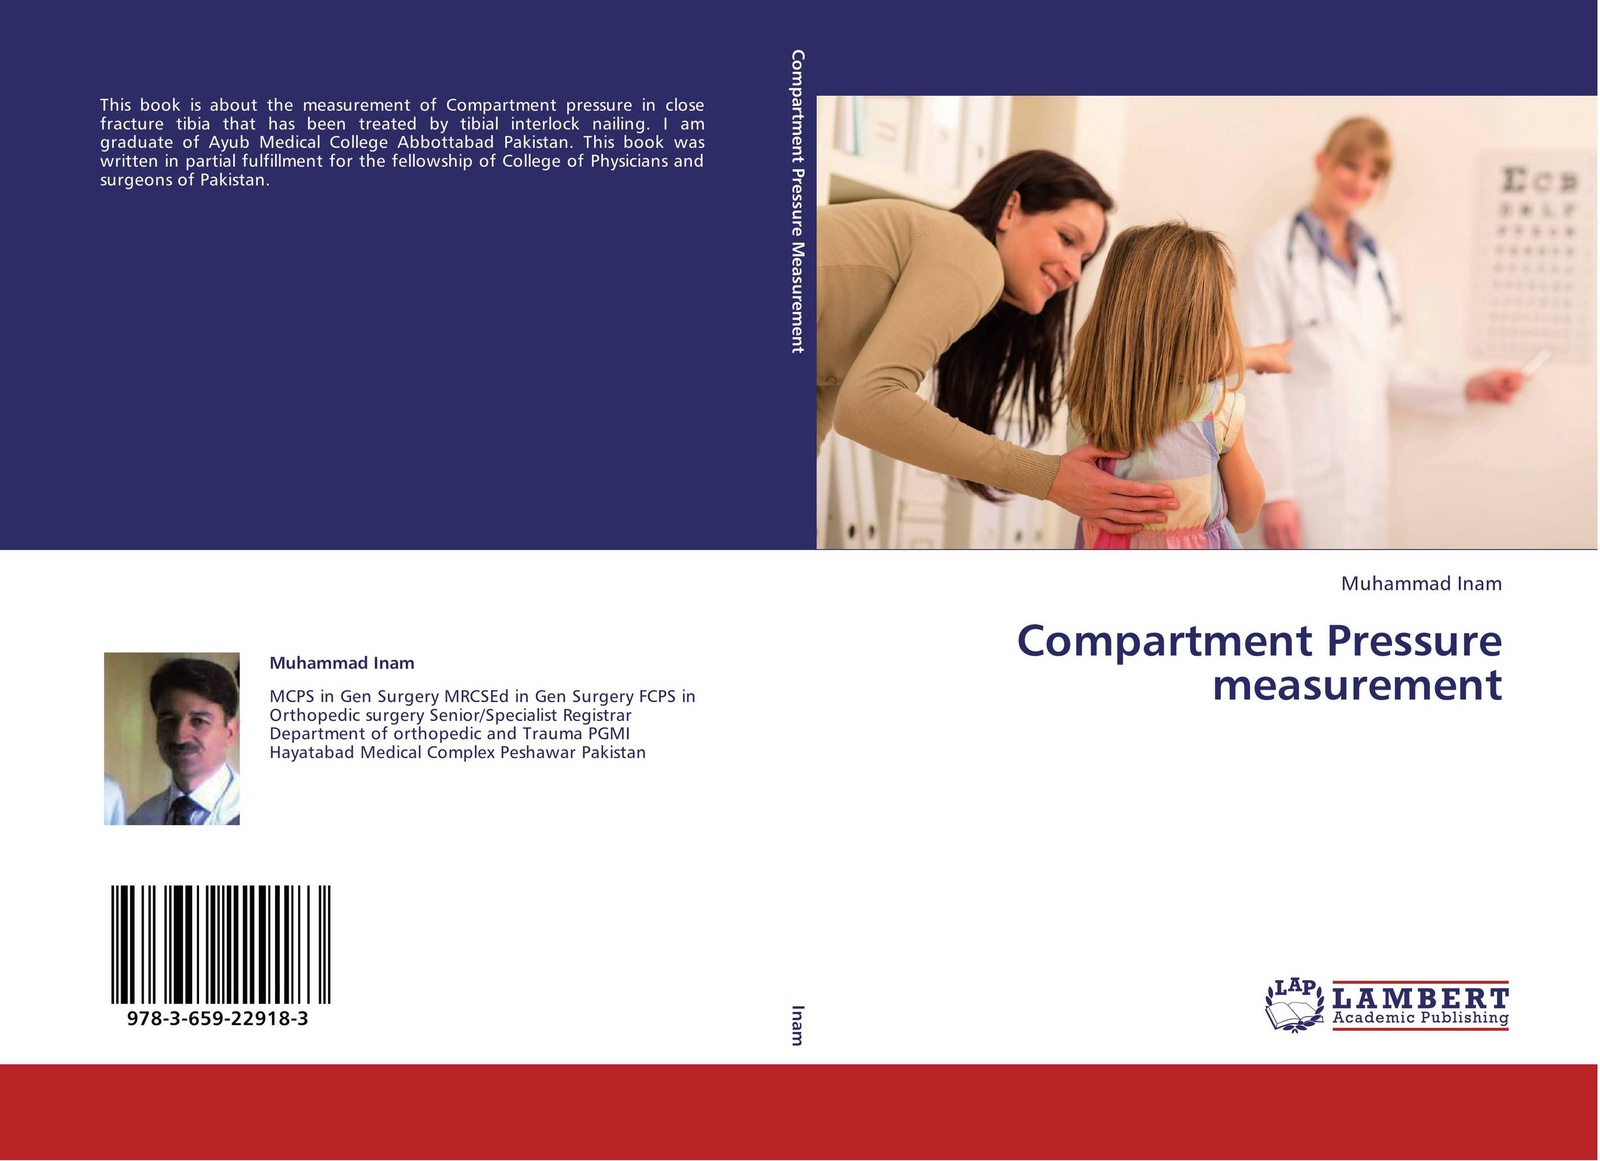 Muhammad Inam Compartment Pressure measurement muhammad altaf qureshi universalization of primary education in pakistan